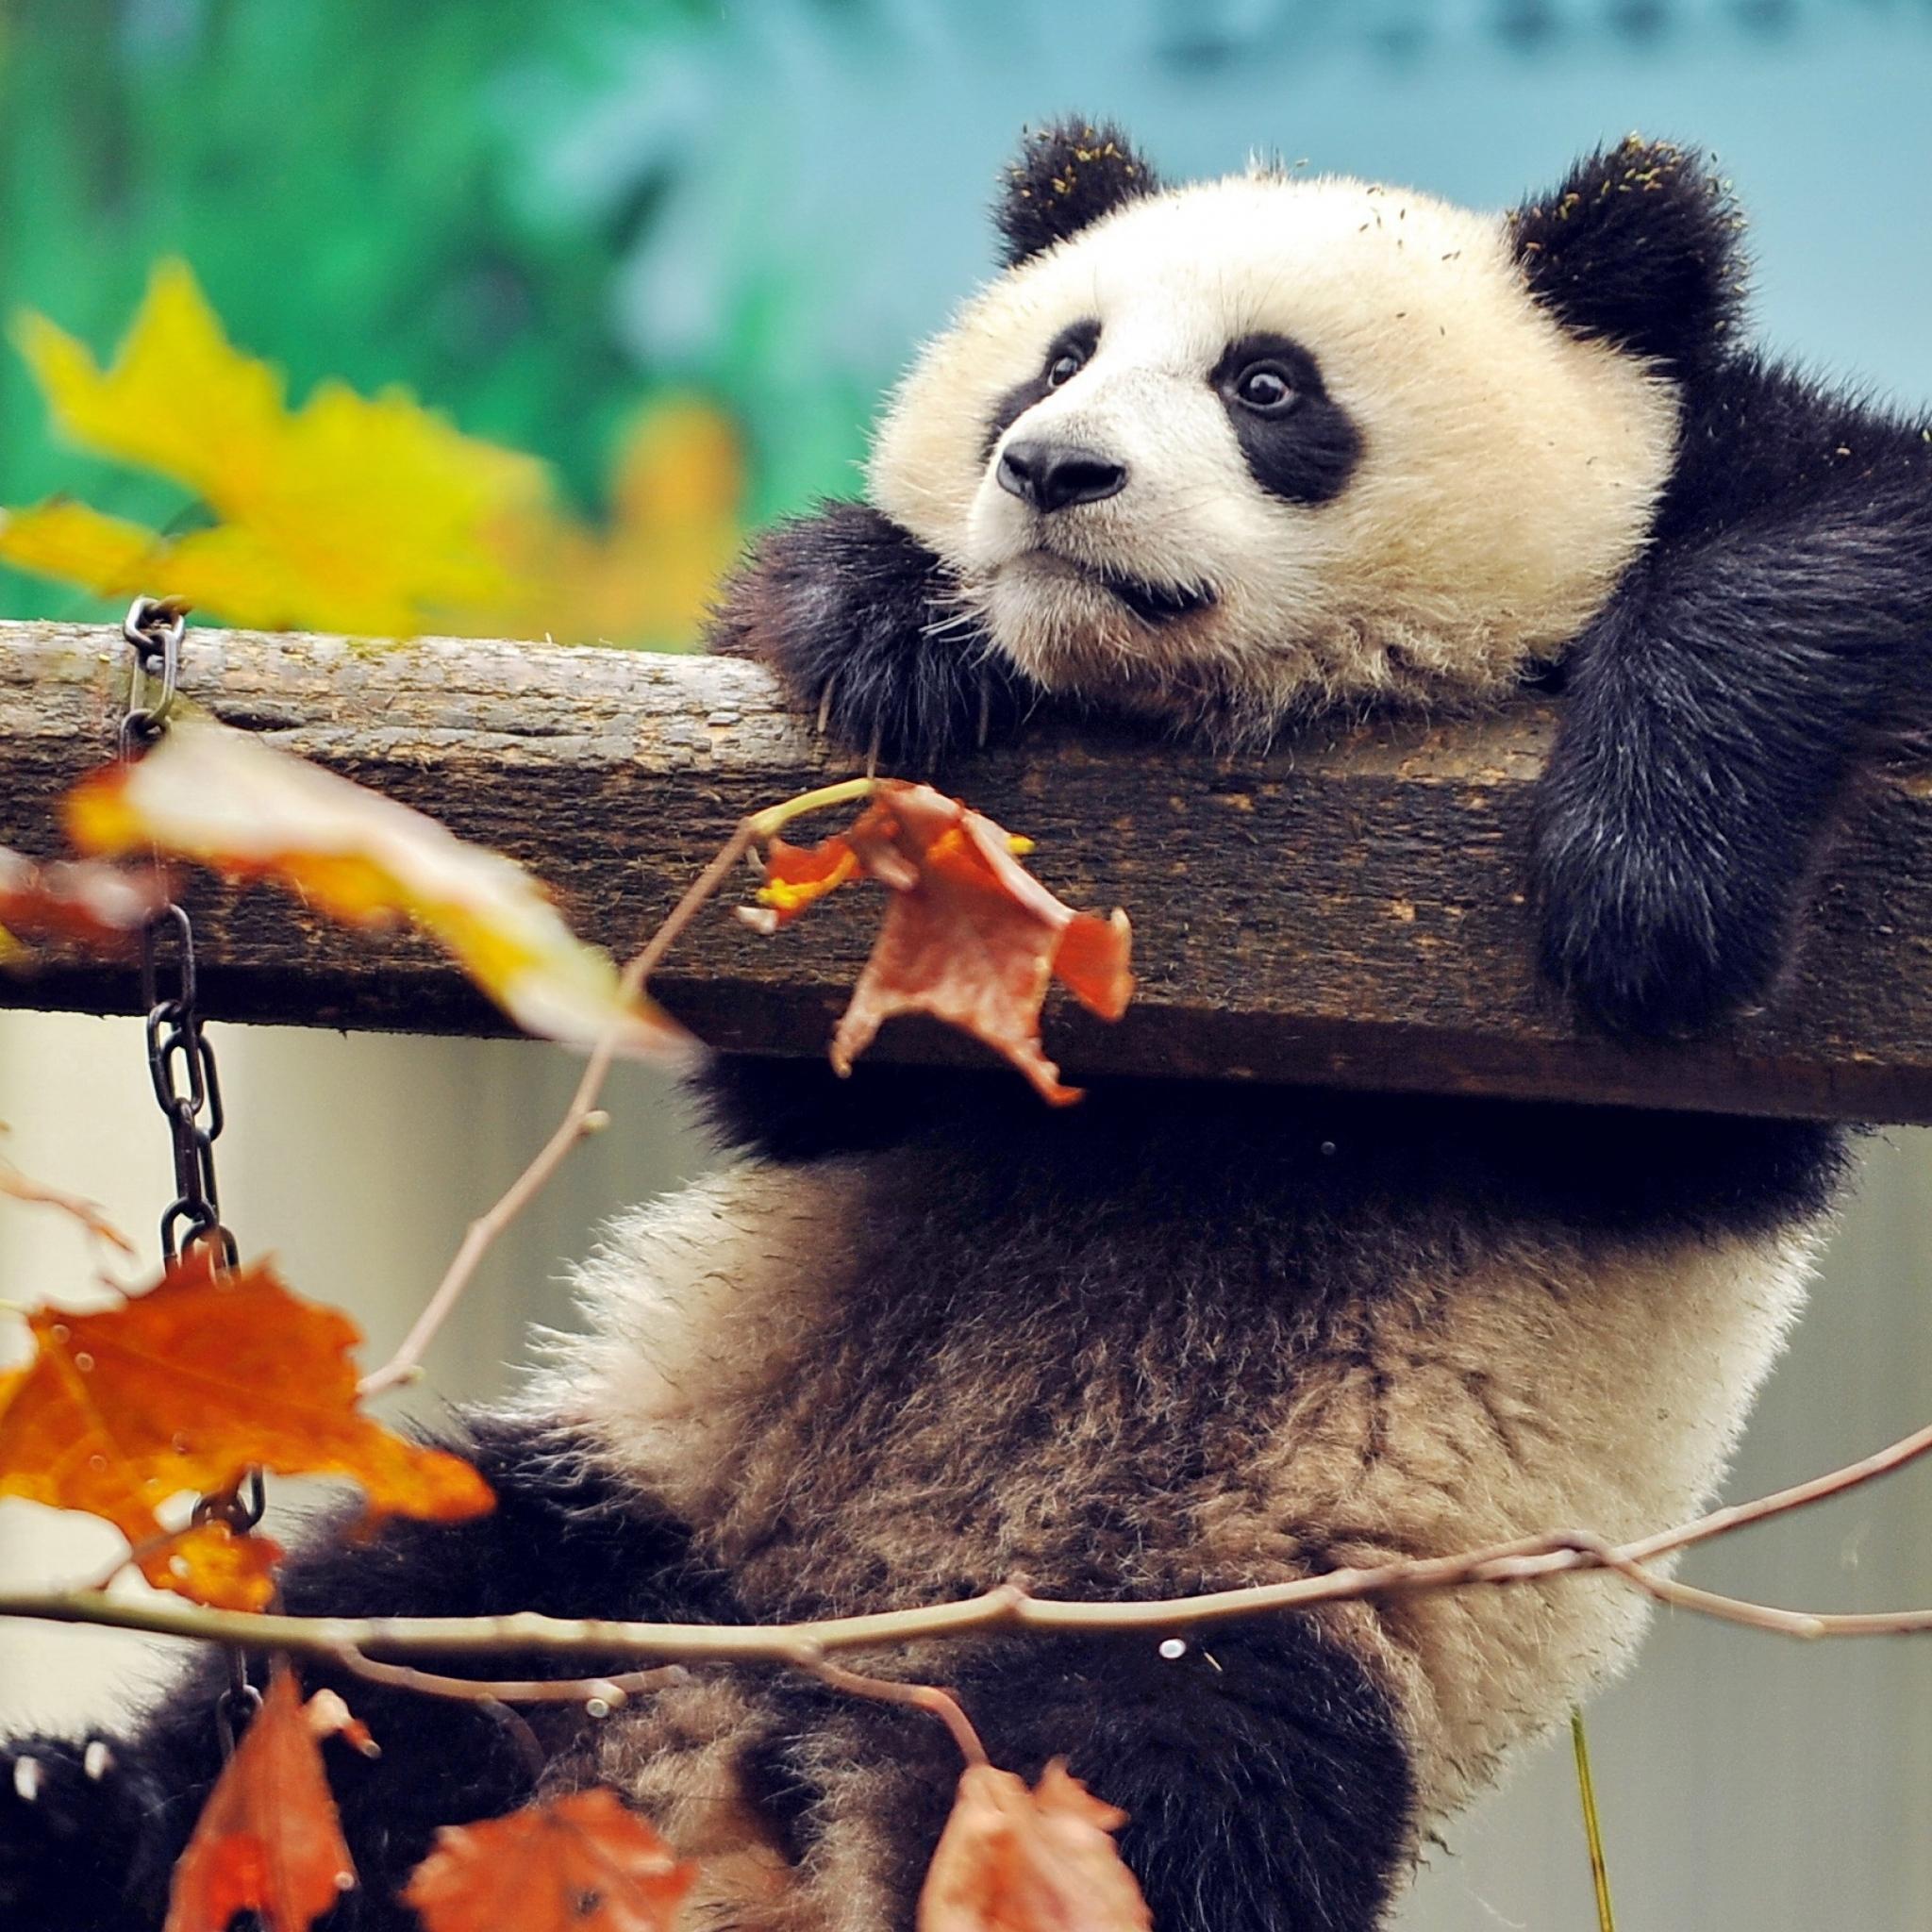 2048x2048 Cute Panda Ipad Air HD 4k Wallpapers Images Backgrounds